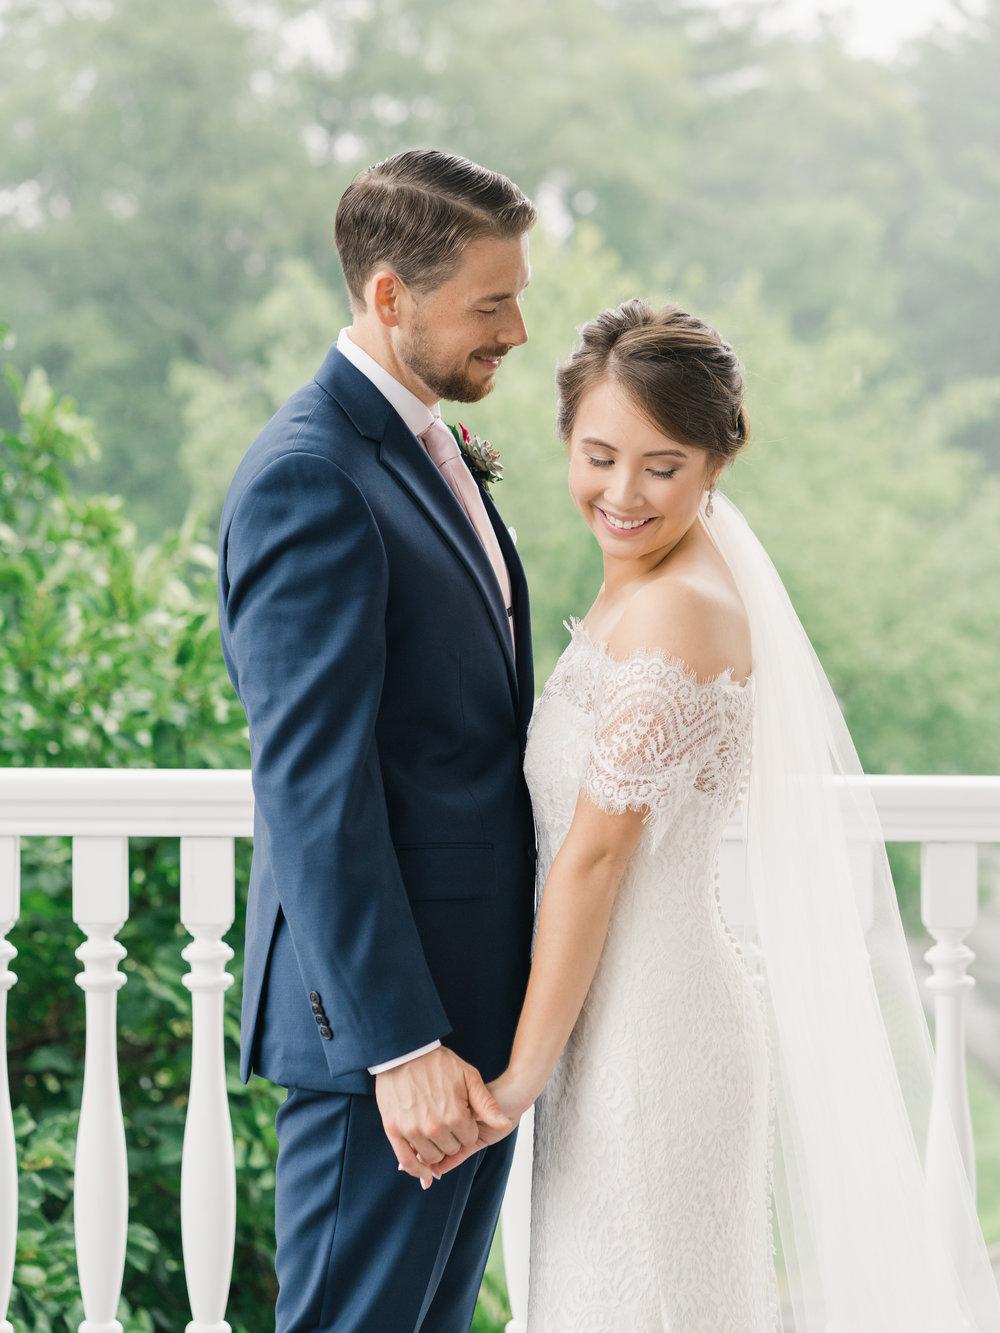 hannah-cochran-photography-joe-and-susan-wedding-37.jpg